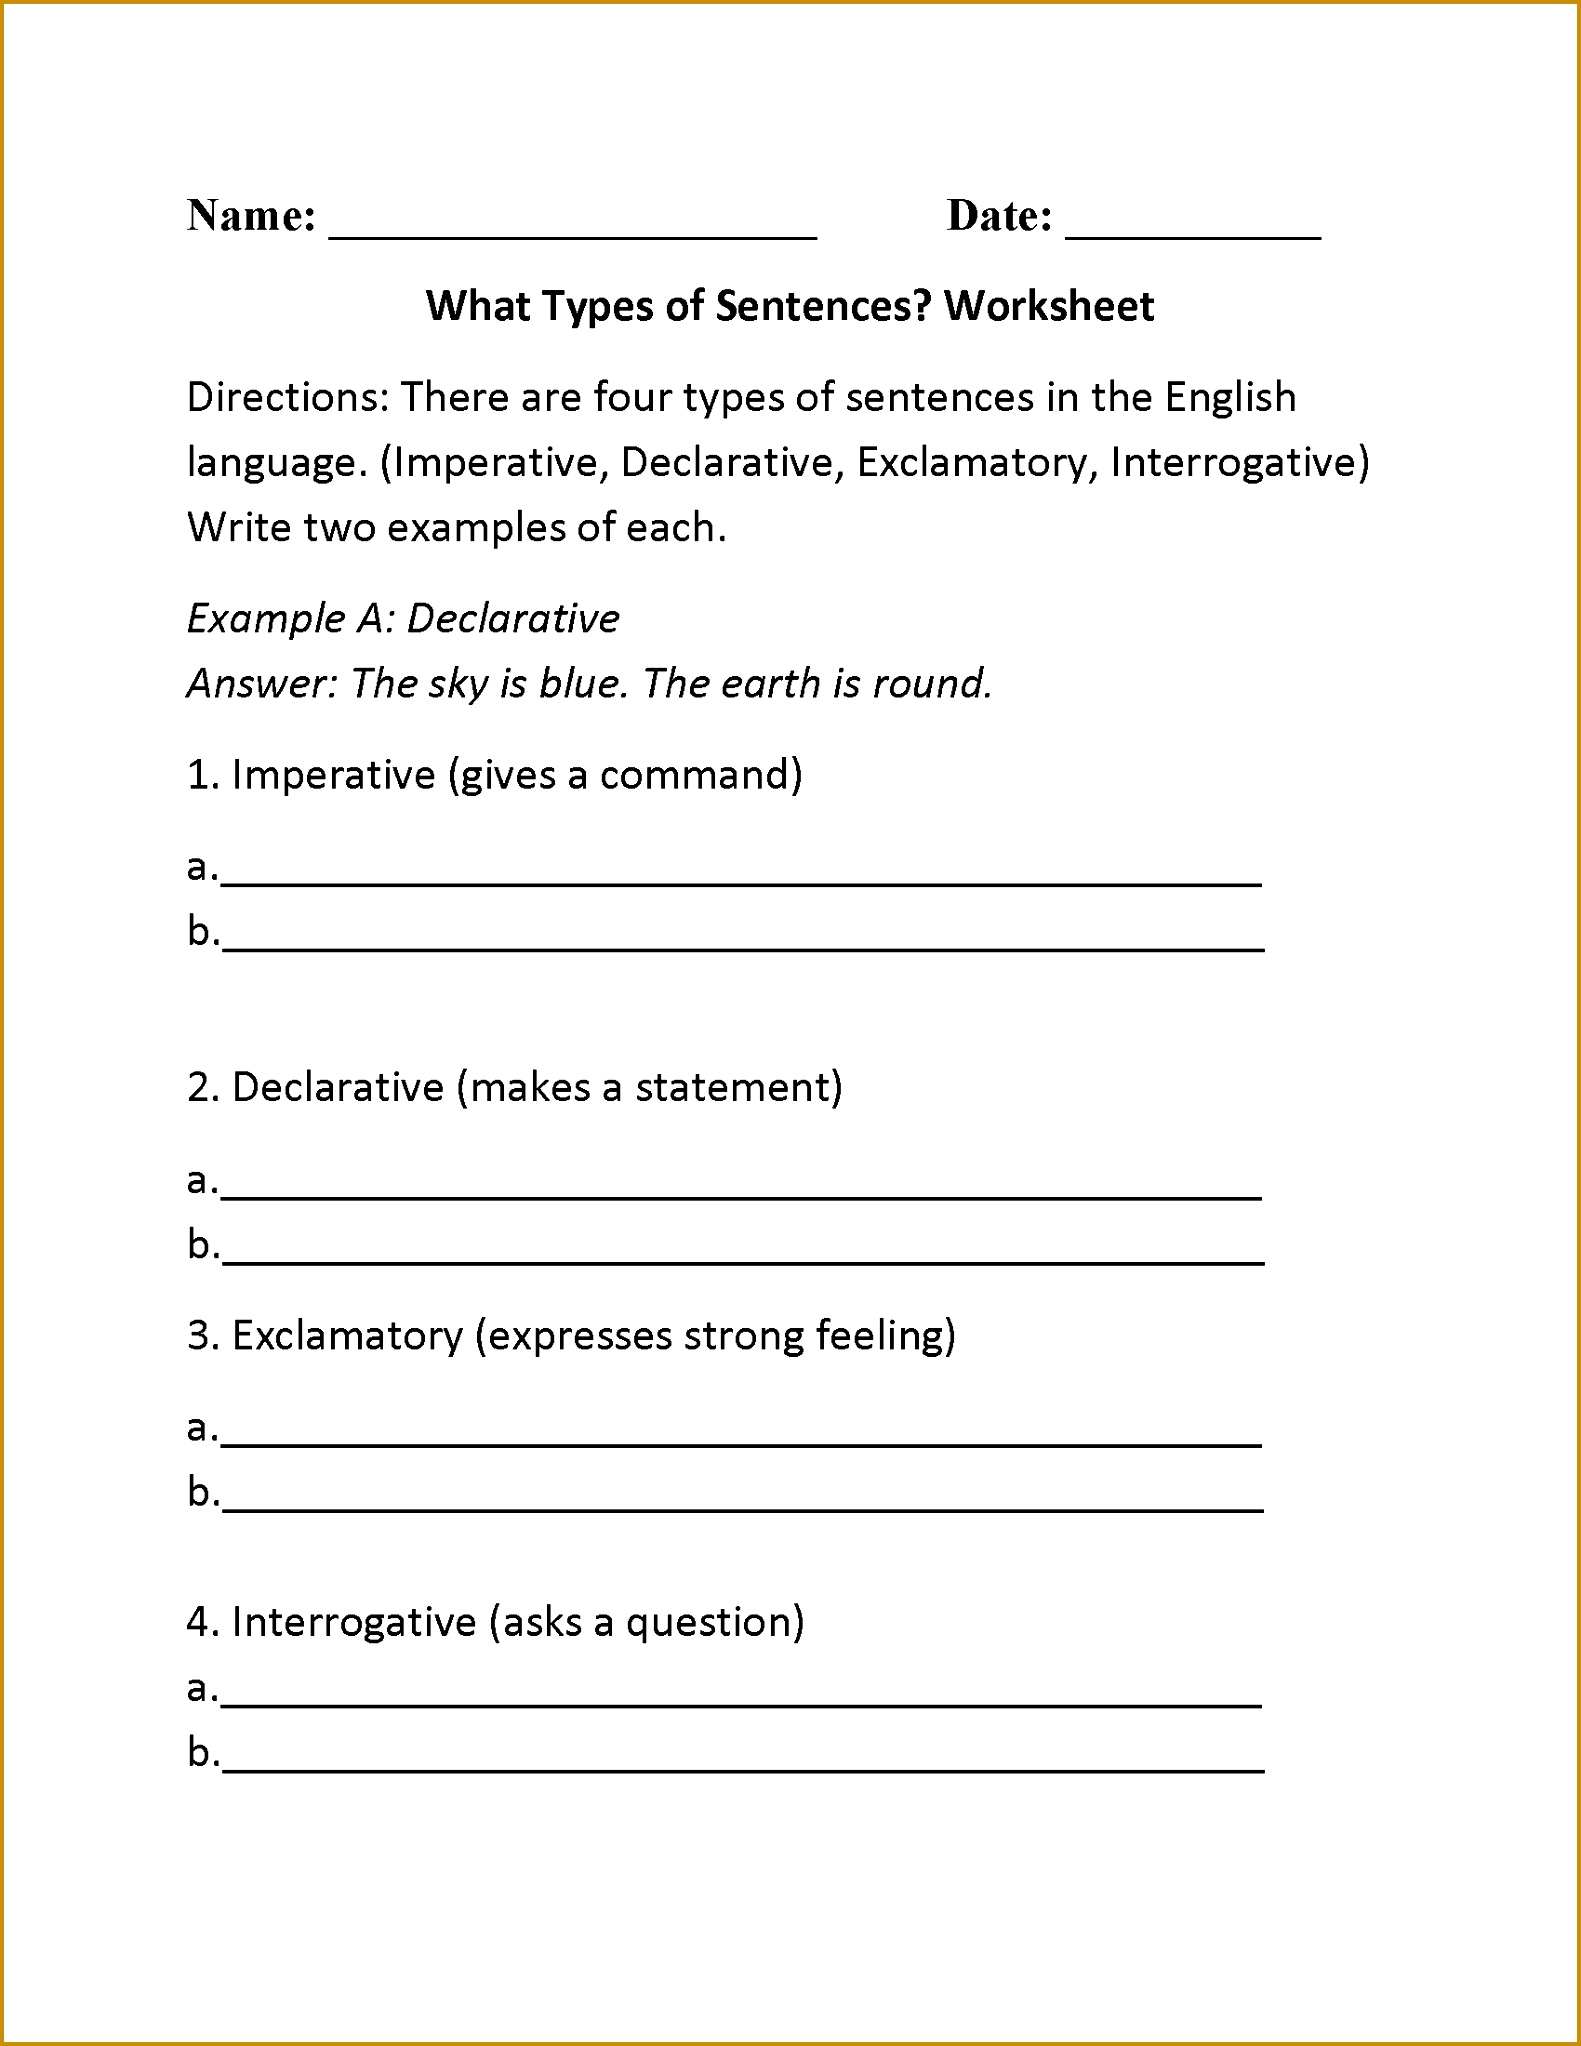 4 Capitalization Worksheets